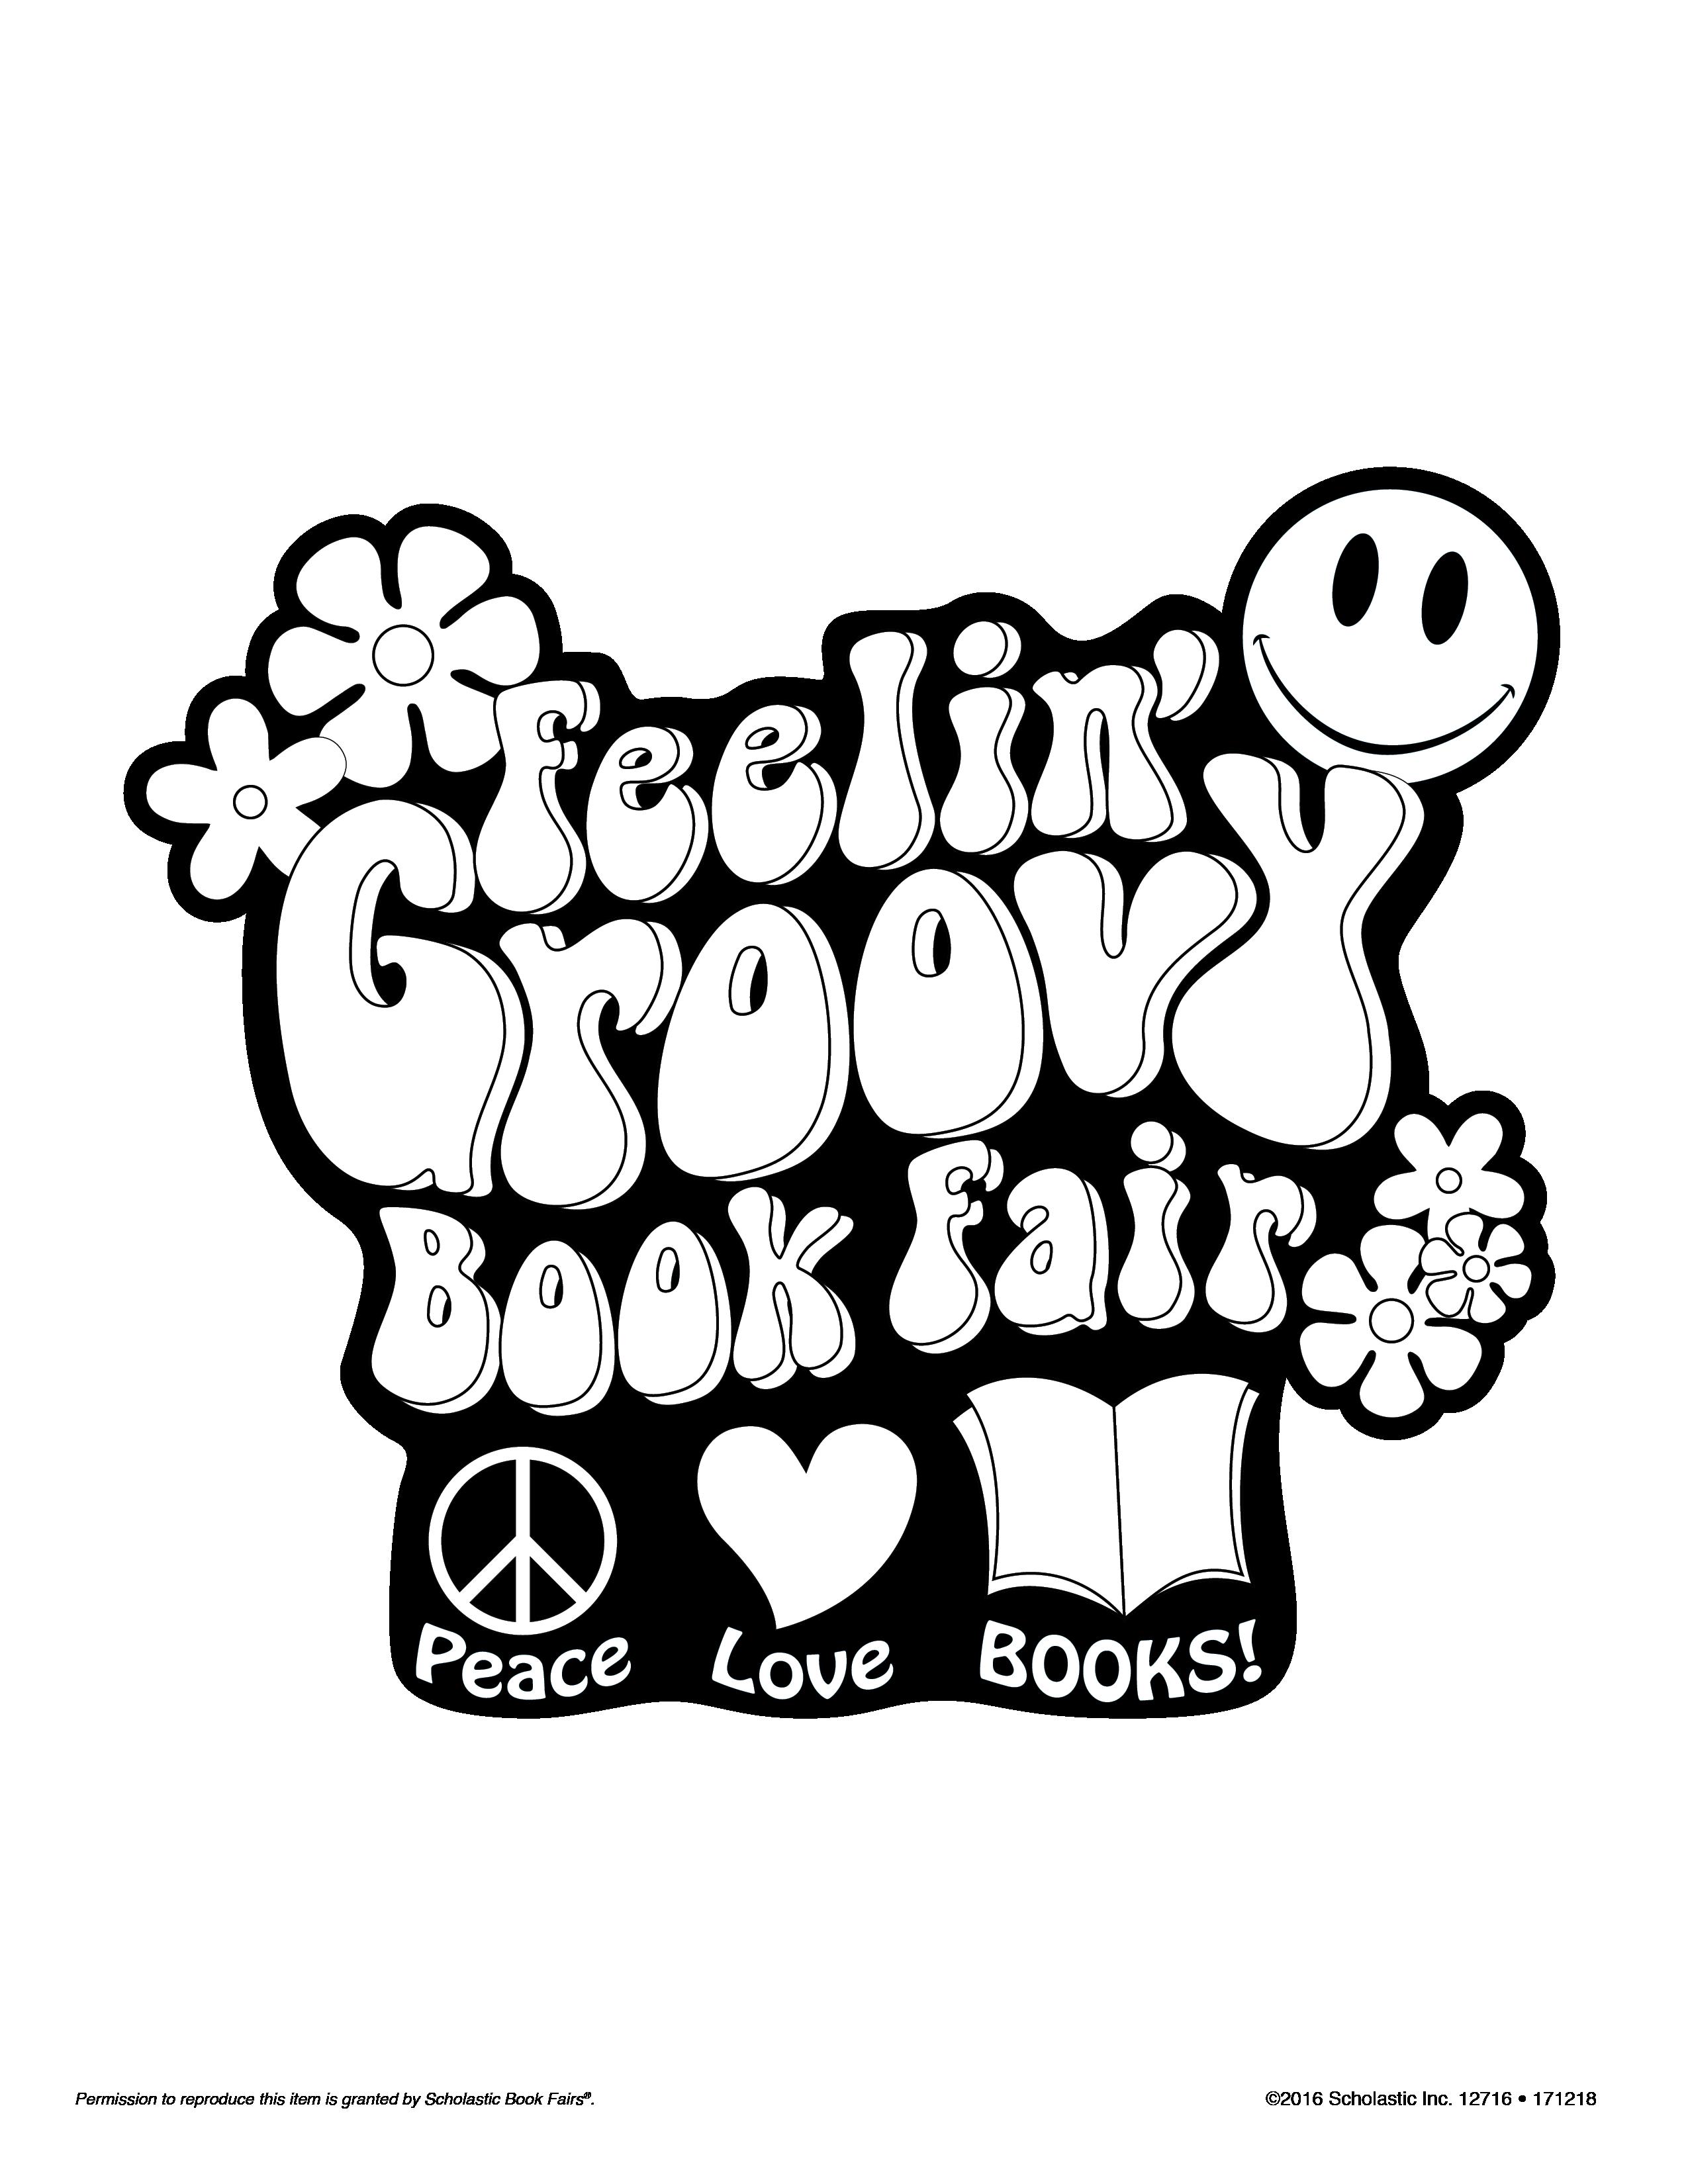 Book fair feelin groovy clipart free download Feelin Groovy Book Fair - Mom&Son free download